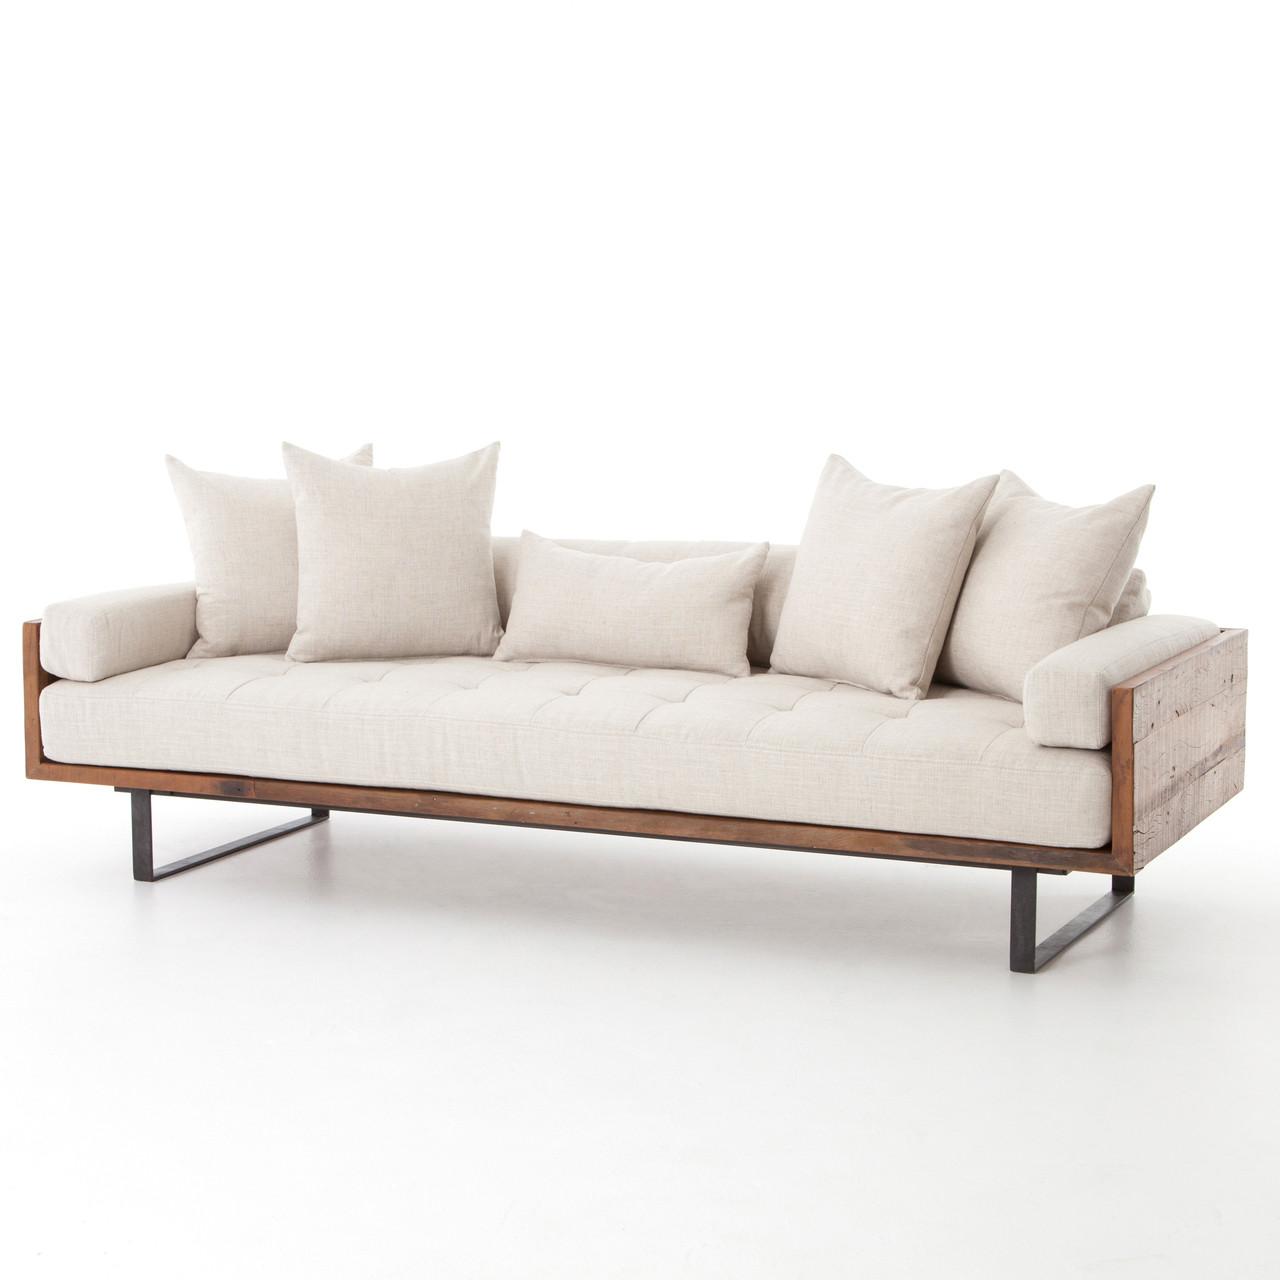 Ranger industrial loft reclaimed wood sofa natural linen